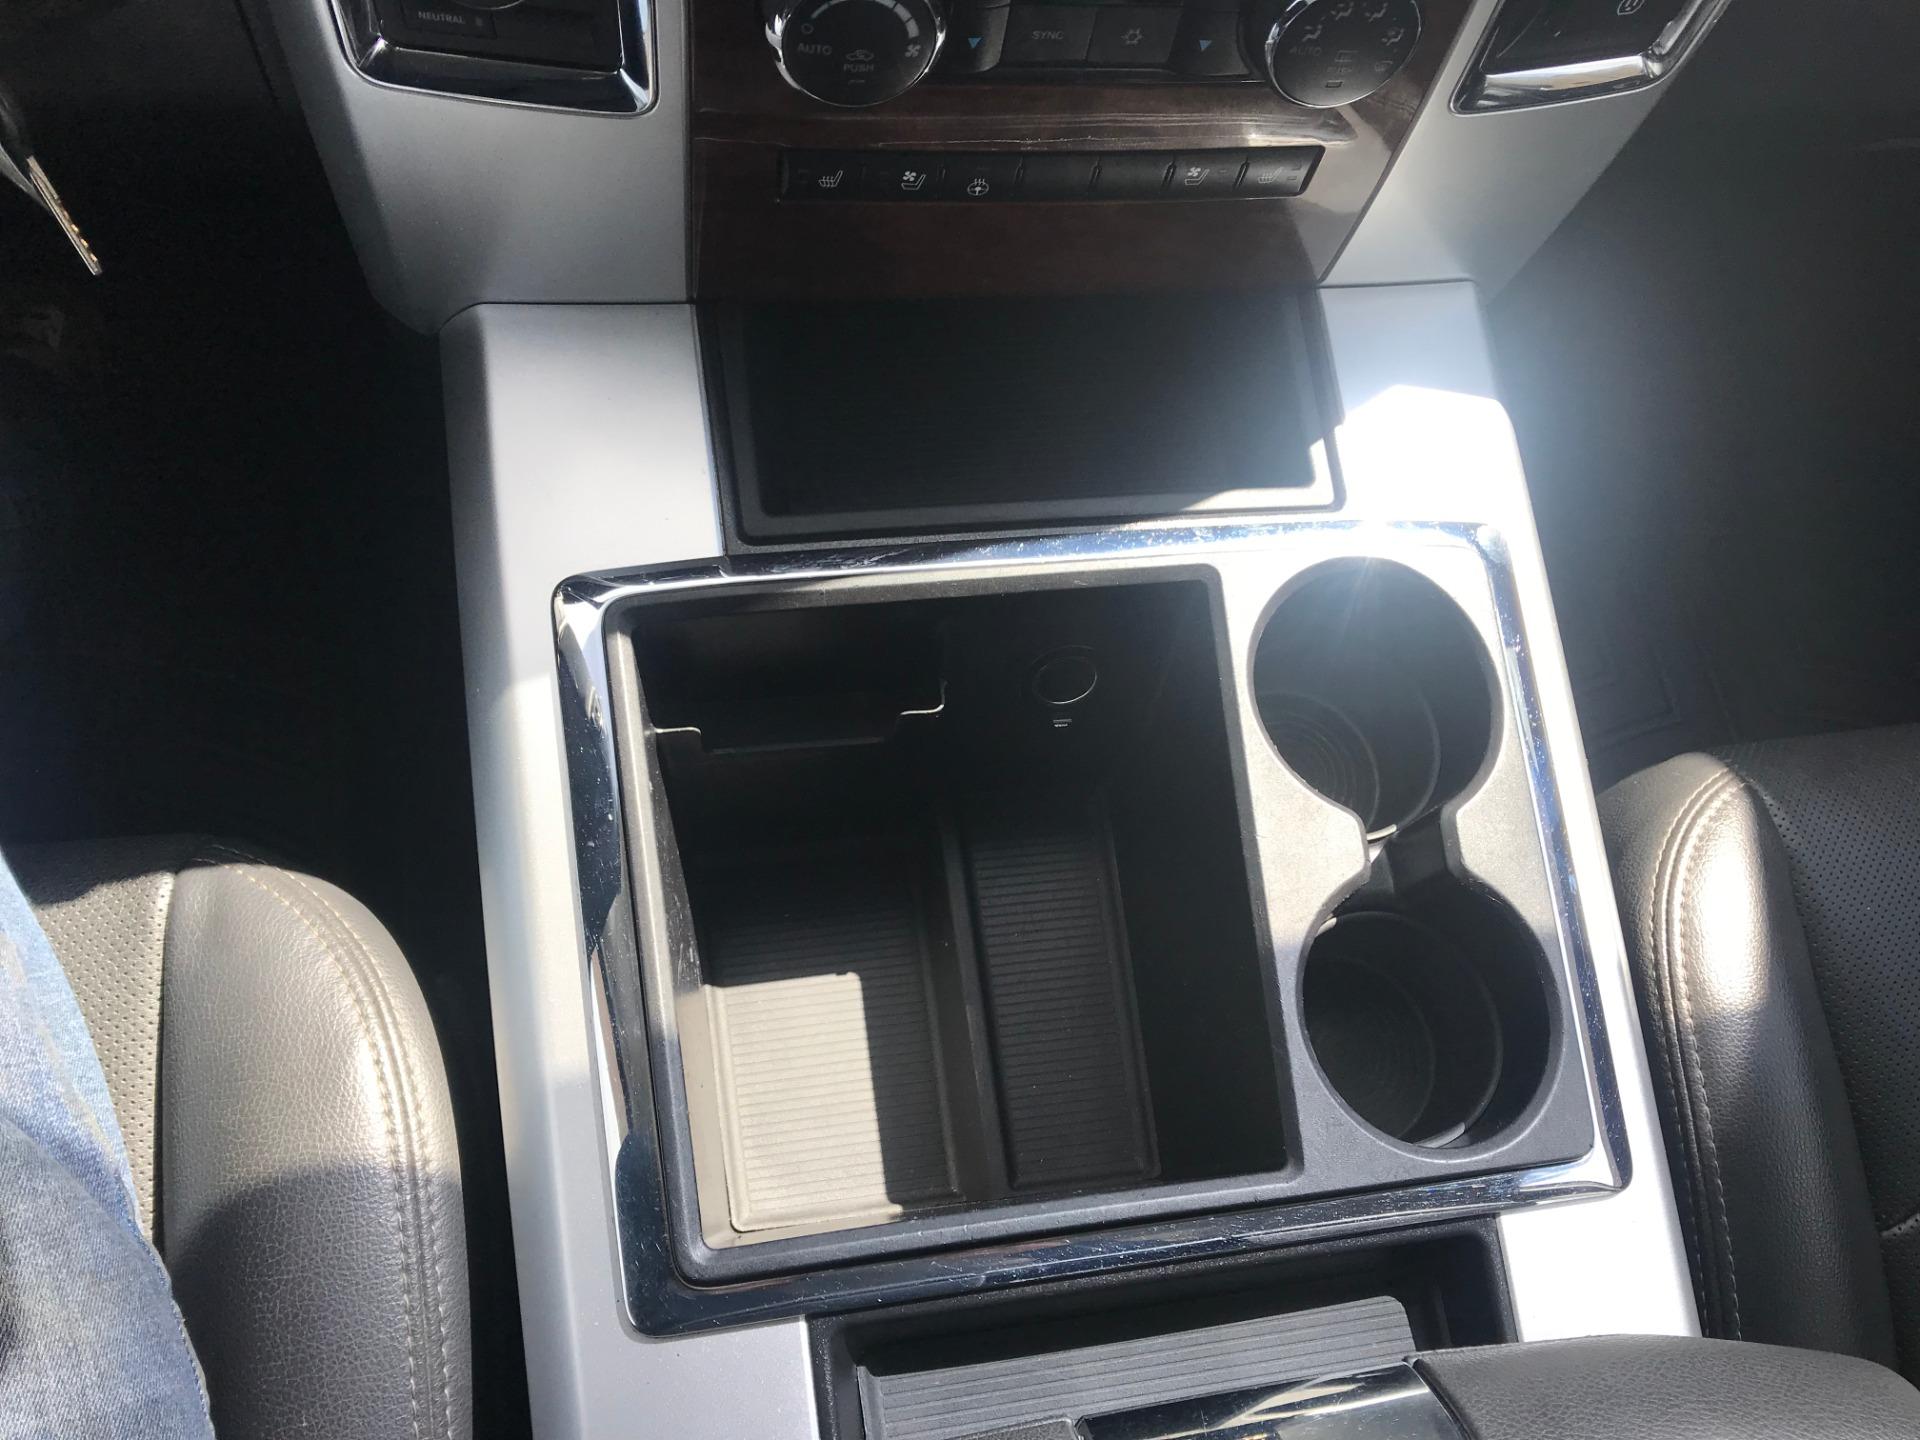 Used-2012-Dodge-Ram-Pickup-2500-DIESEL-Laramie